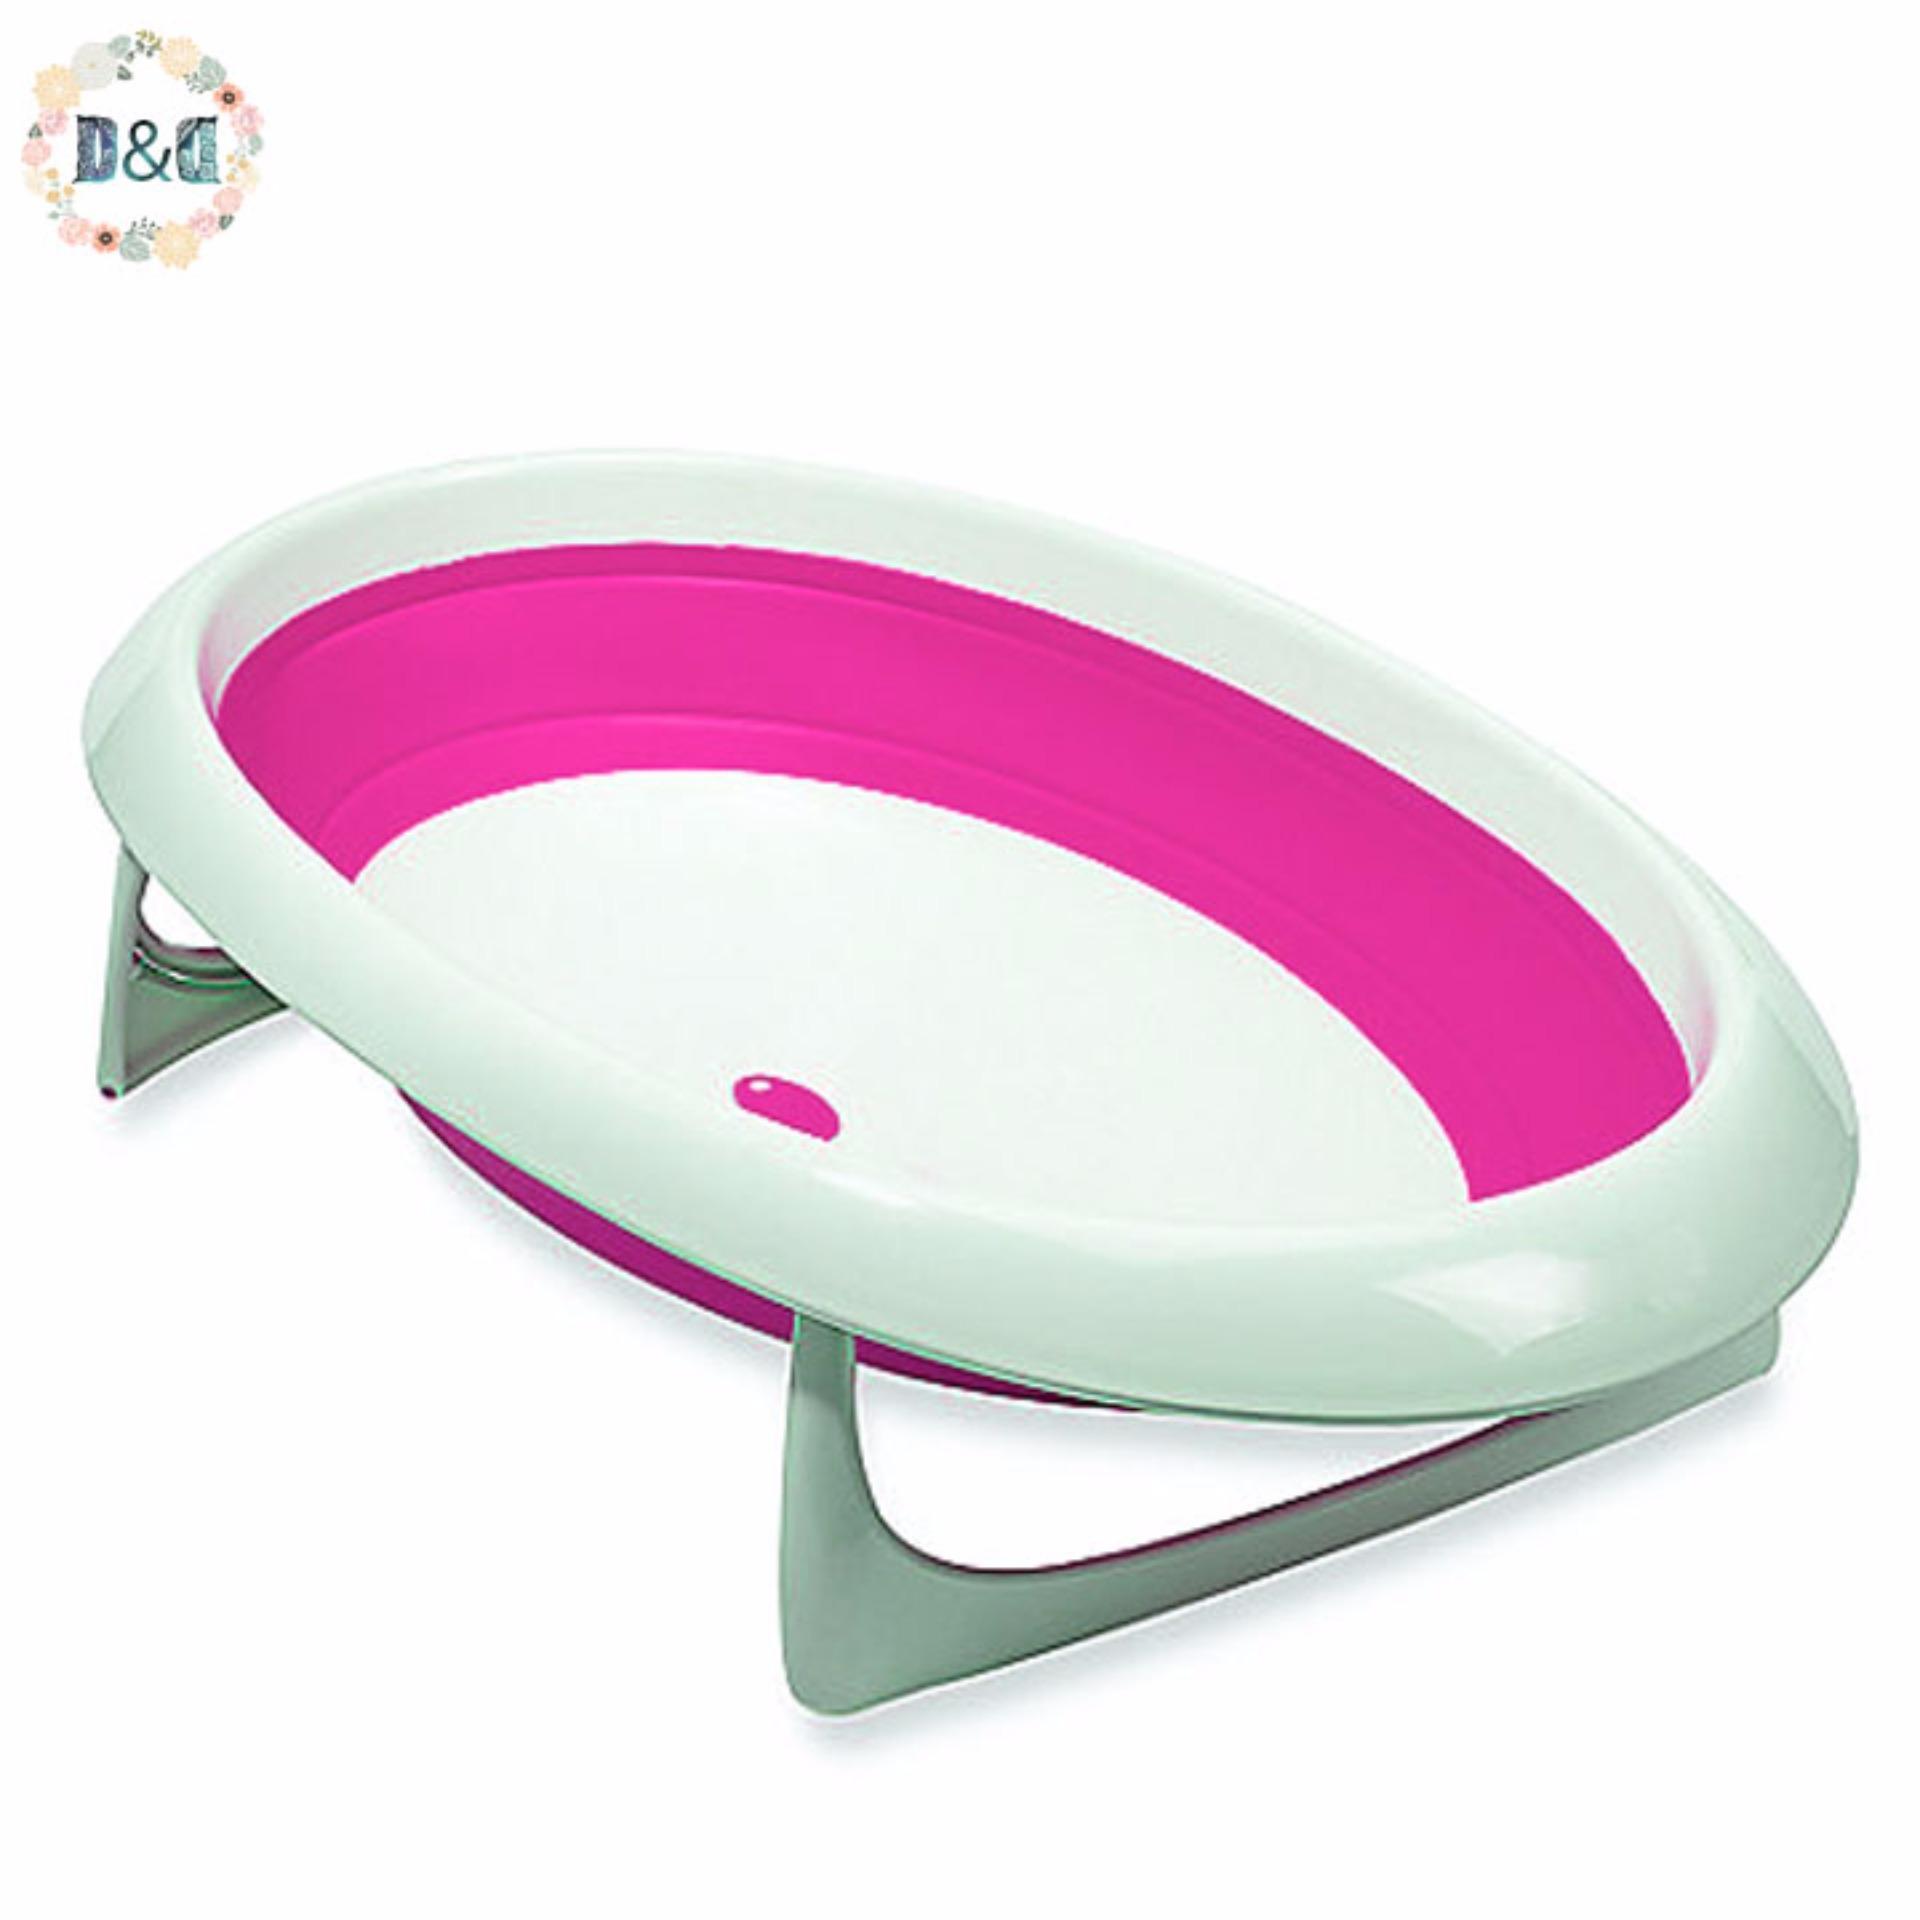 Collapsible Baby Bathtub Philippines - Bathtub Ideas